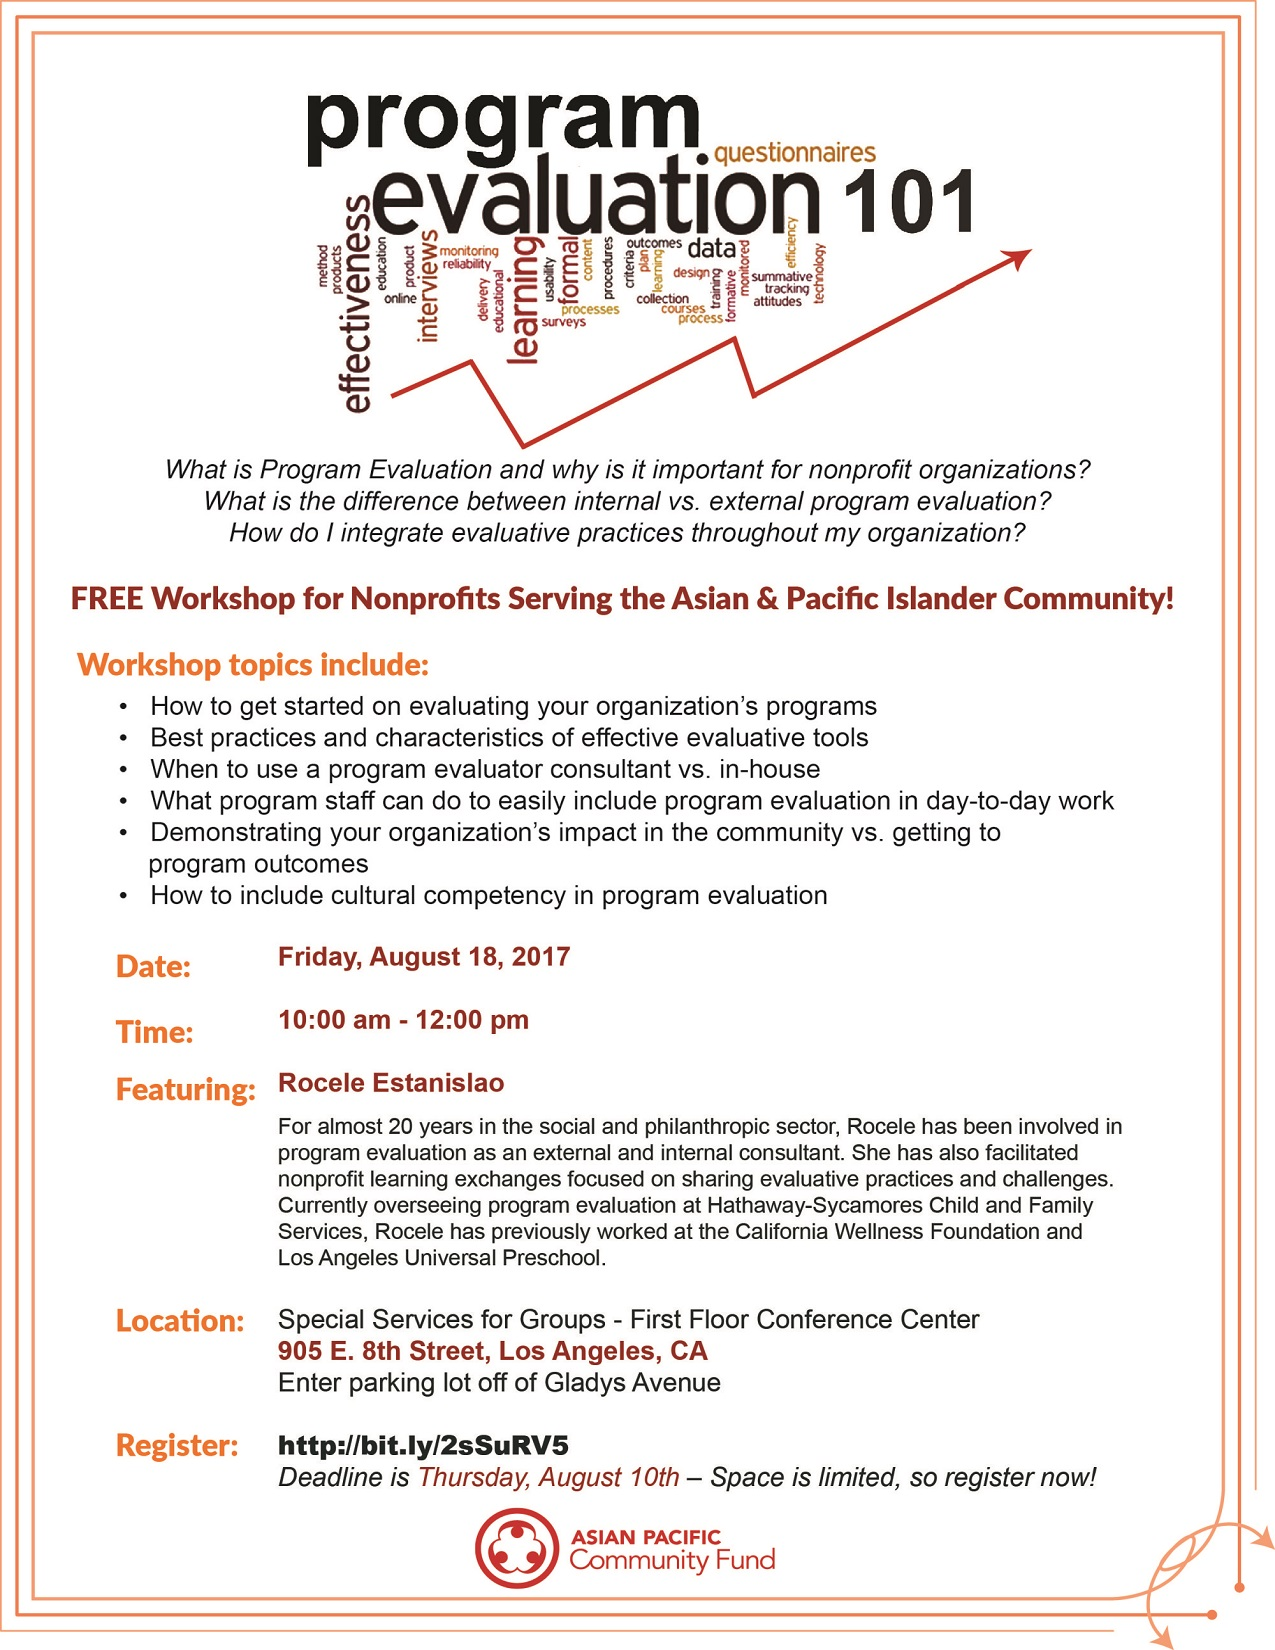 08.18.17-Program-Evaluation101-flier.jpg